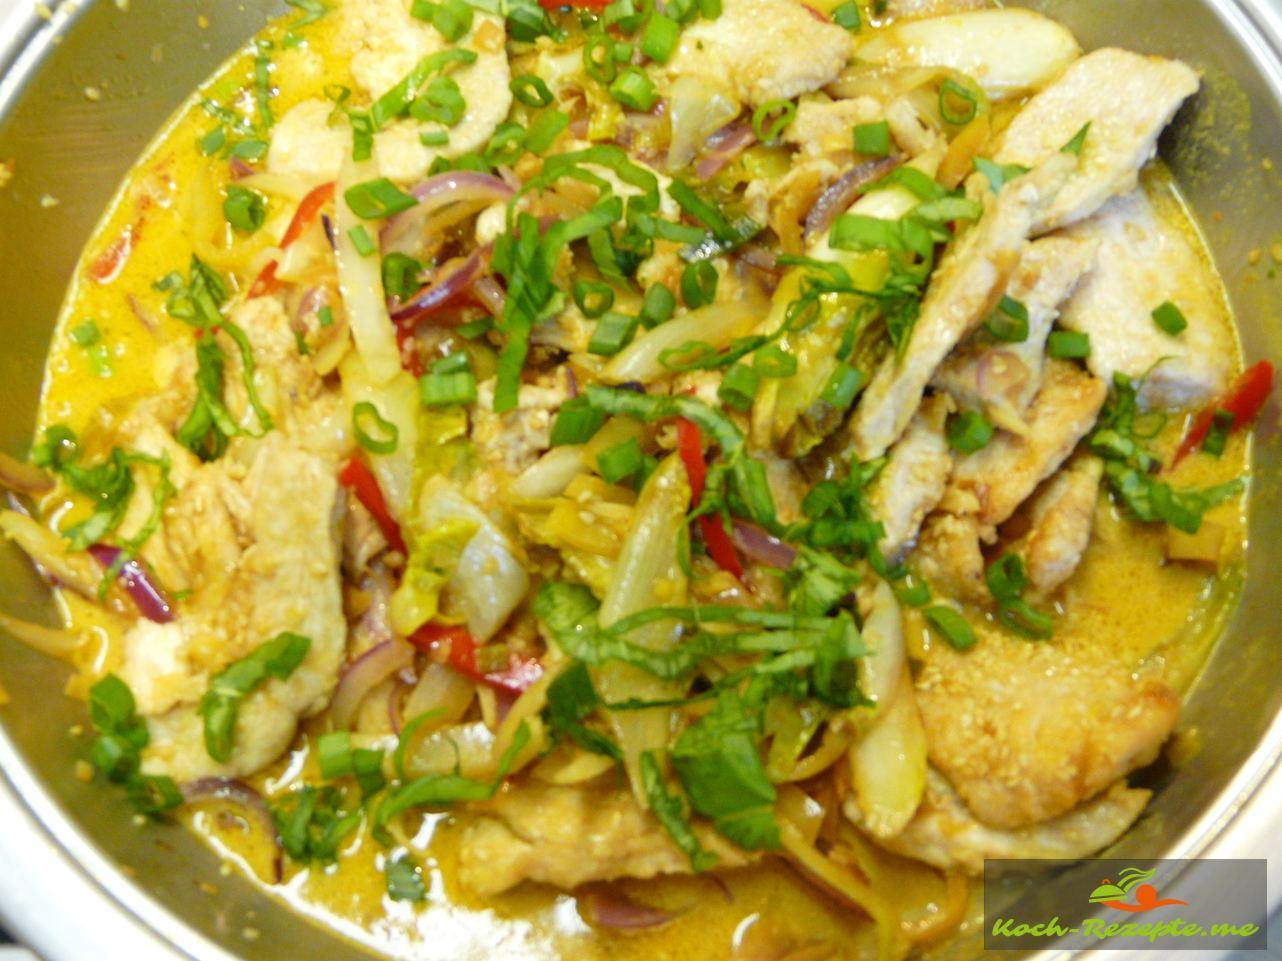 Curry-Huhn Thai oder Wok Hähnchen mit Cury-Kokossauce กระทะแกงไก่ซอสมะพร้าวกับผัก